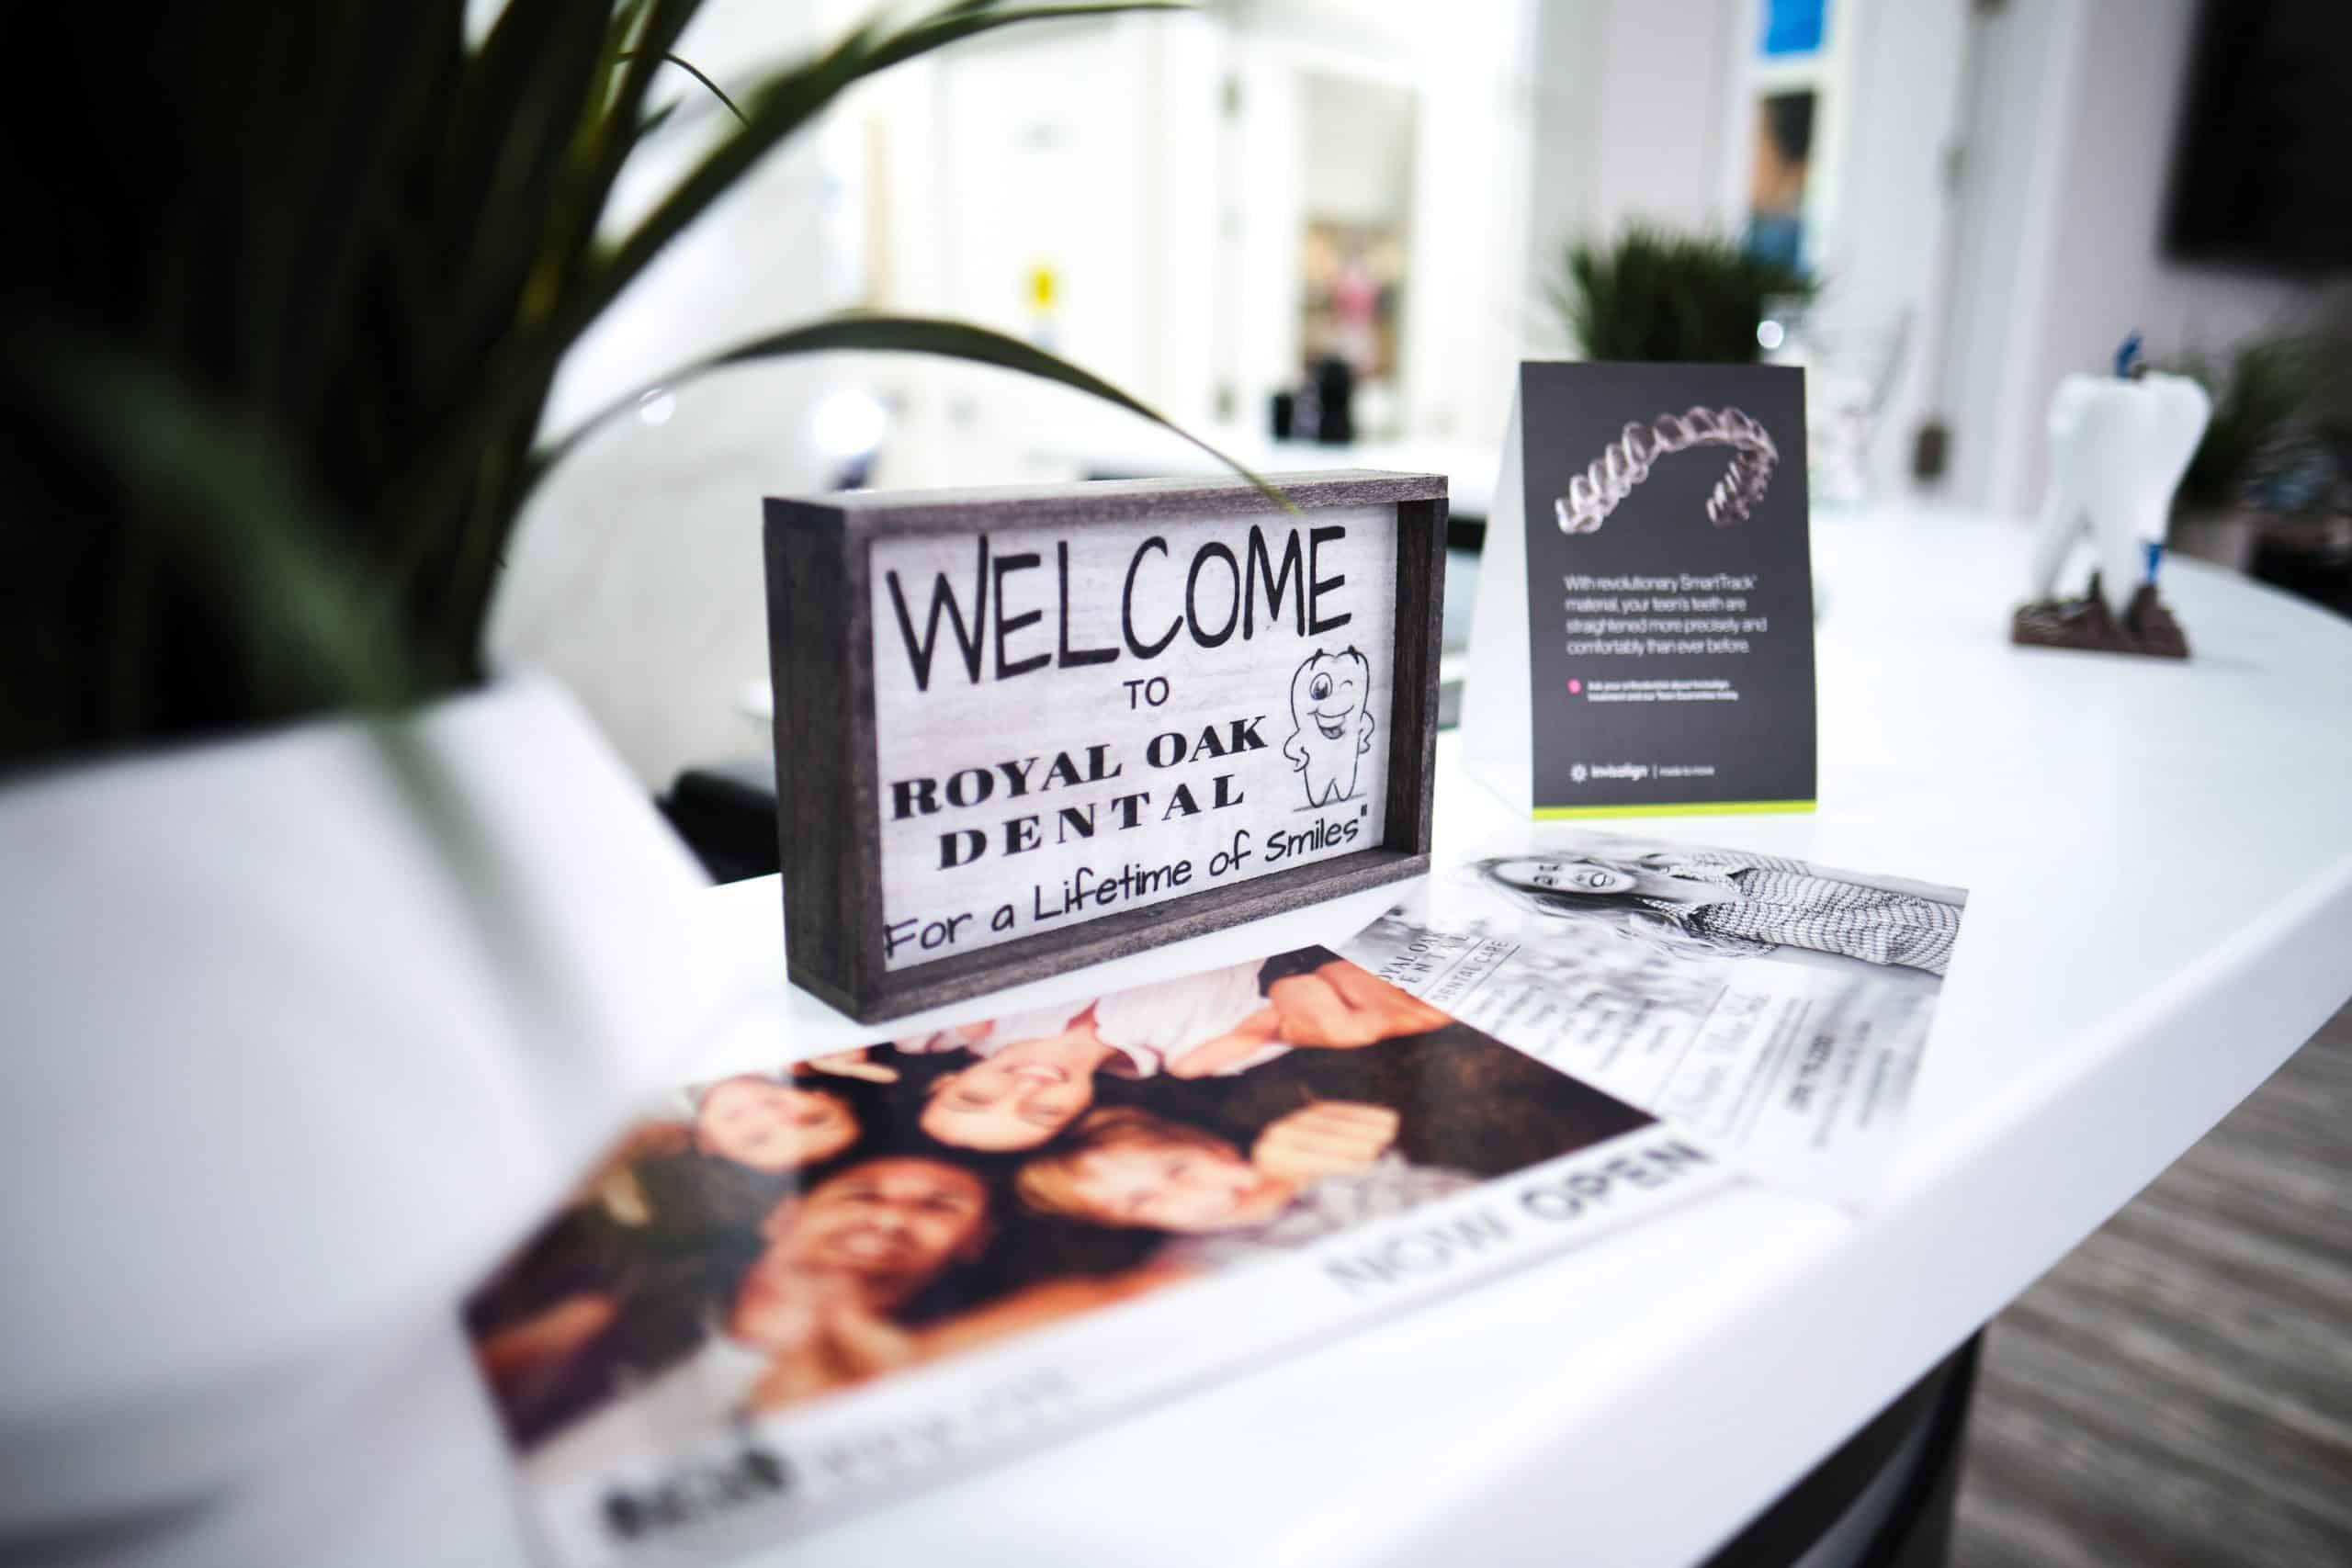 Royal Oak Dental | Oakville Family Dentist - Welcoming new patients